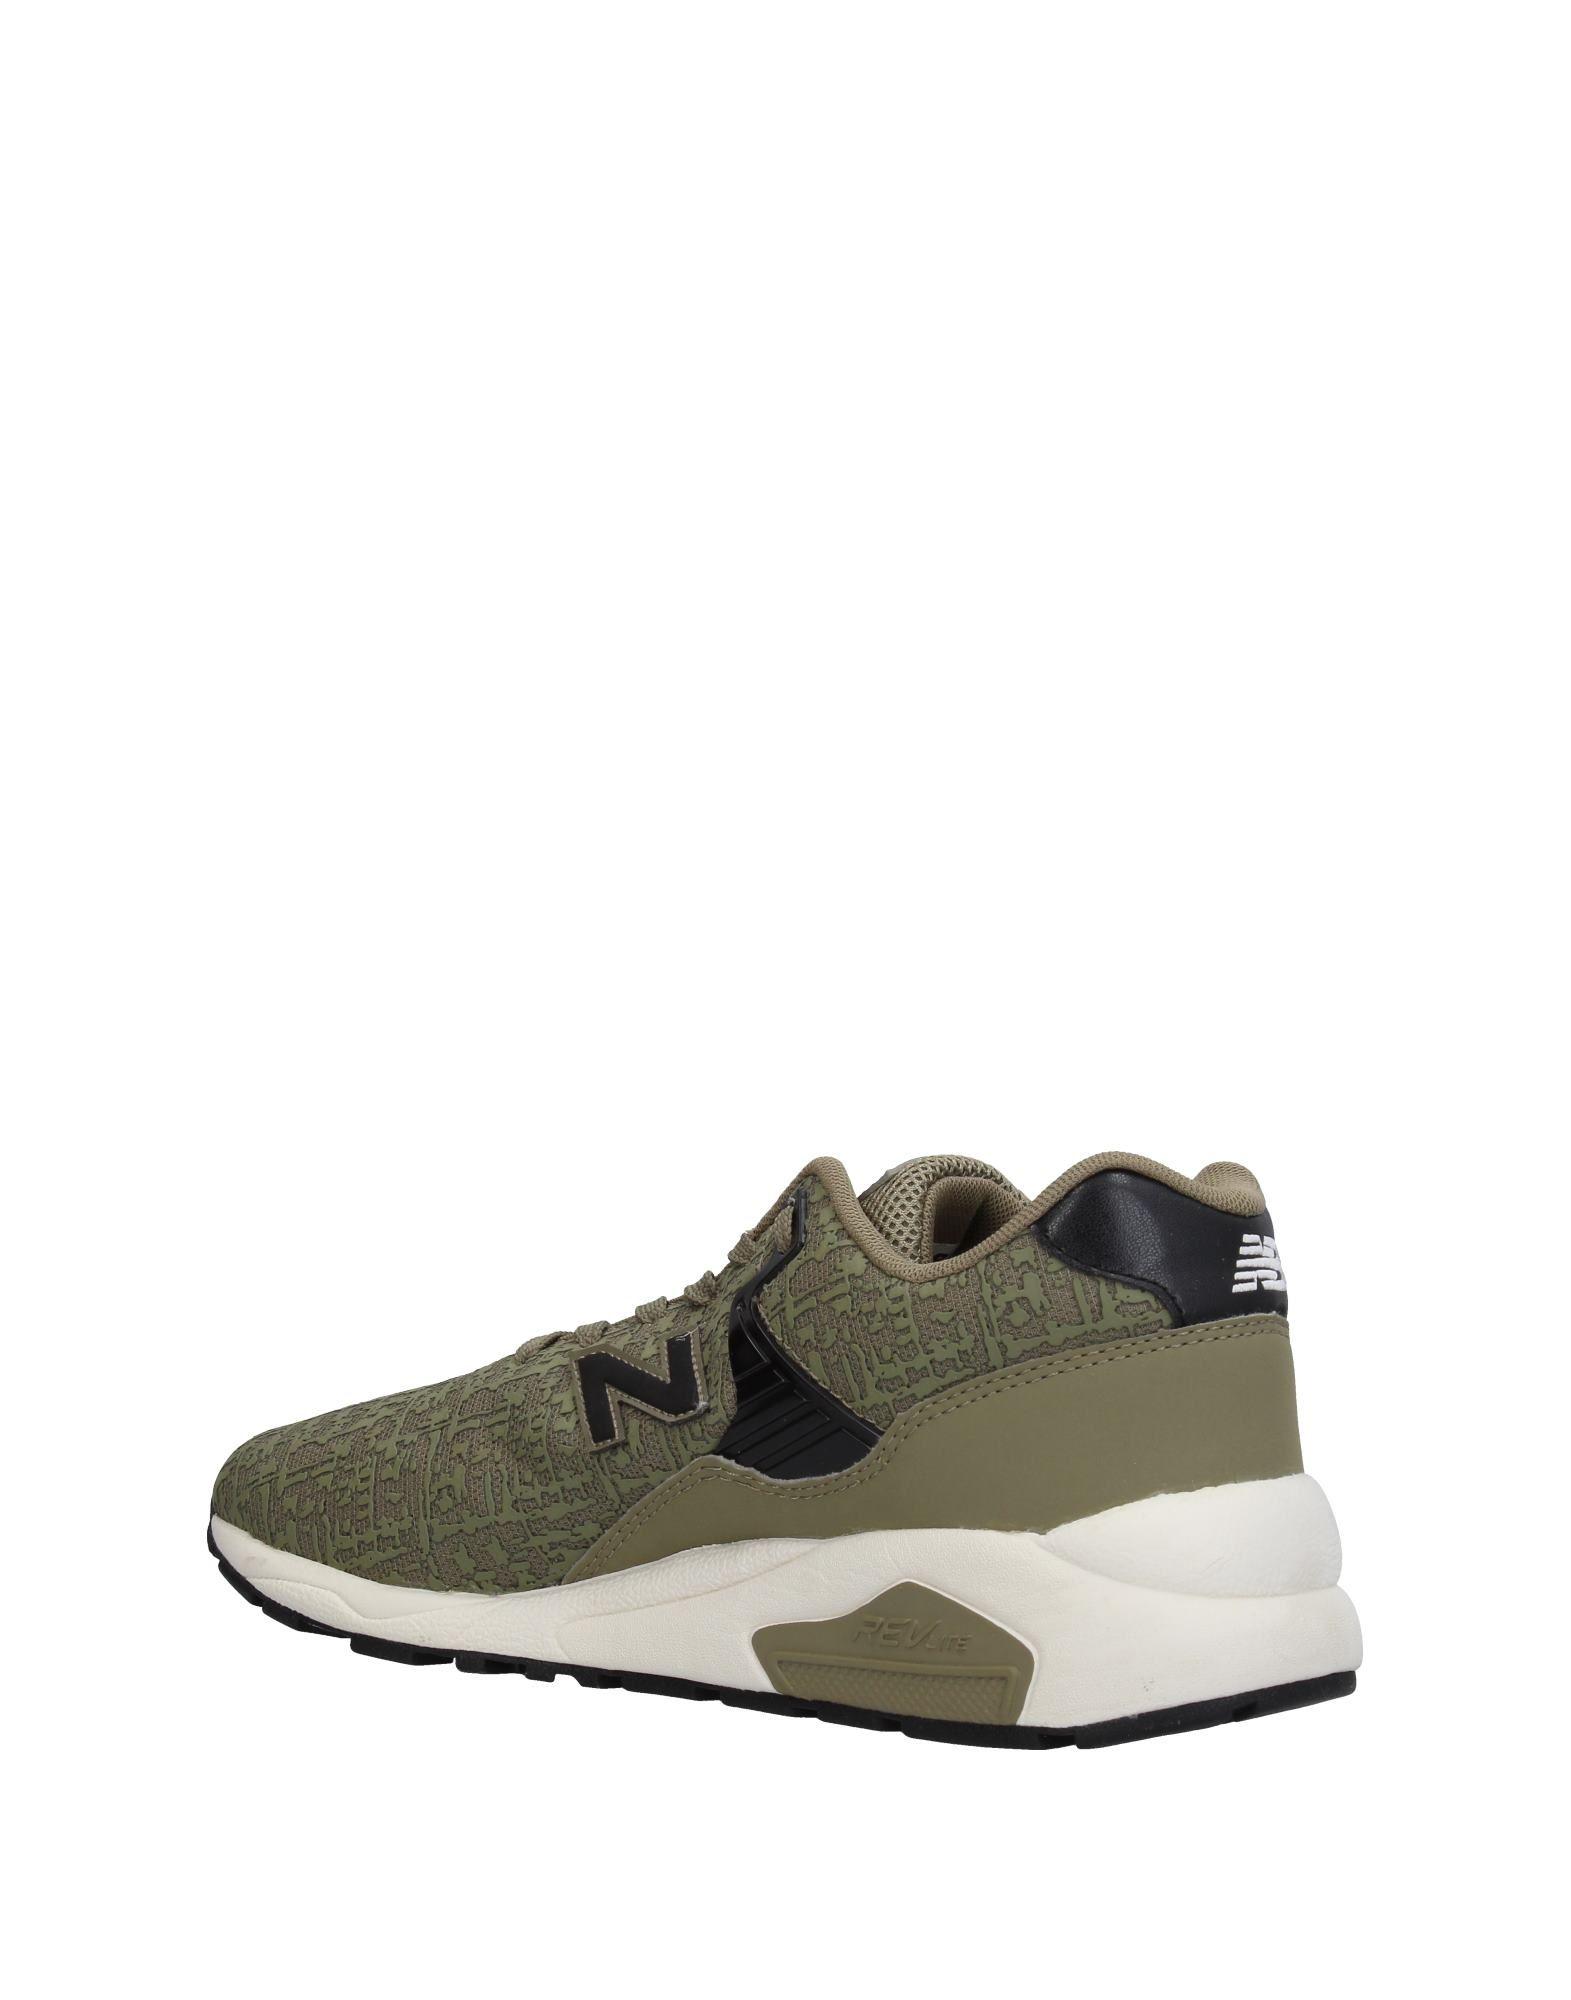 Rabatt Schuhe echte Schuhe Rabatt New Balance Sneakers Herren  11390436FW a662d4